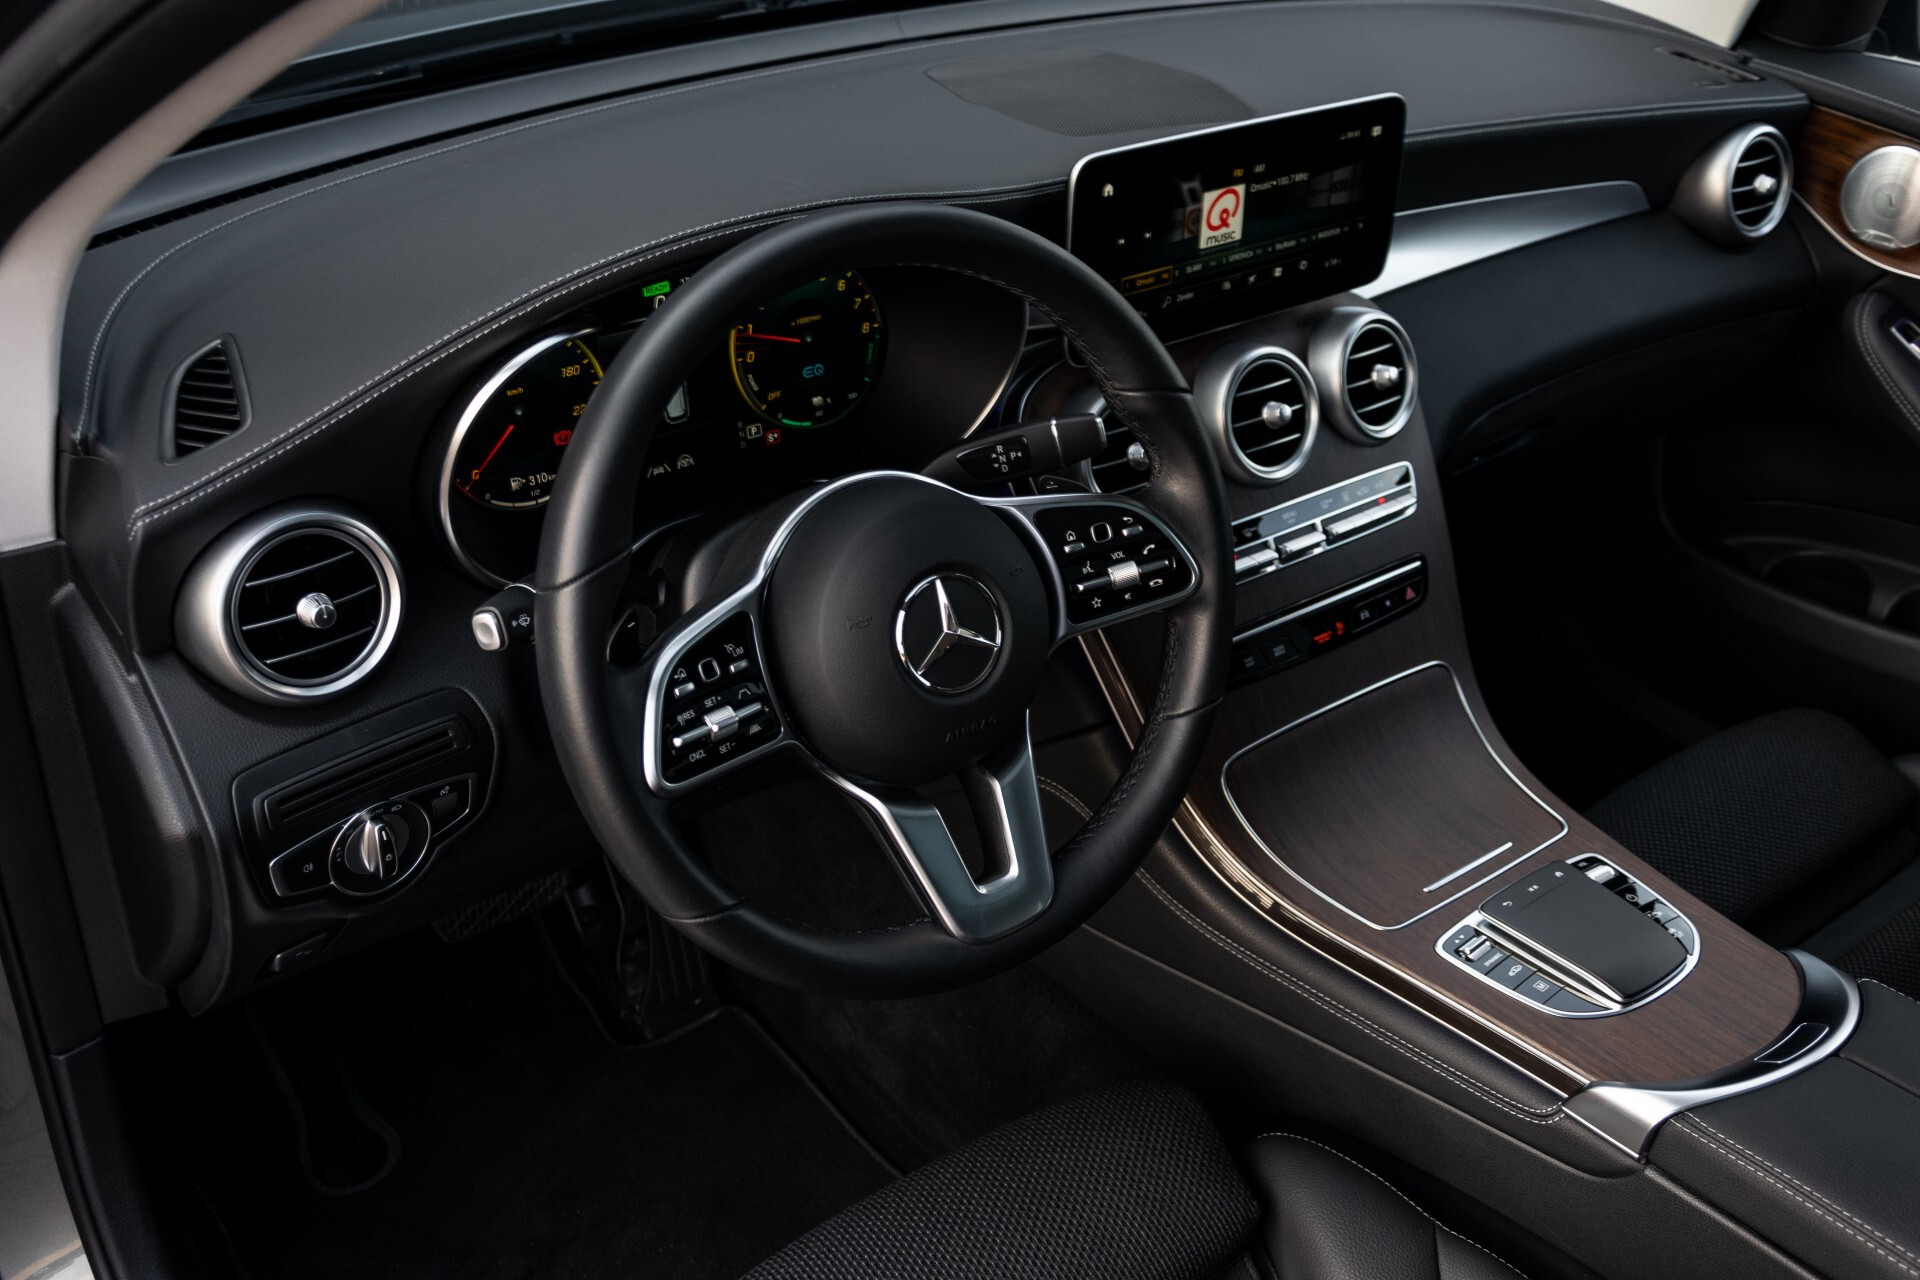 Mercedes-Benz GLC 300e 4-M Luchtvering/Panorama/Multicontourstoelen/Rij-assistentie/Standkachel Aut9 Foto 17